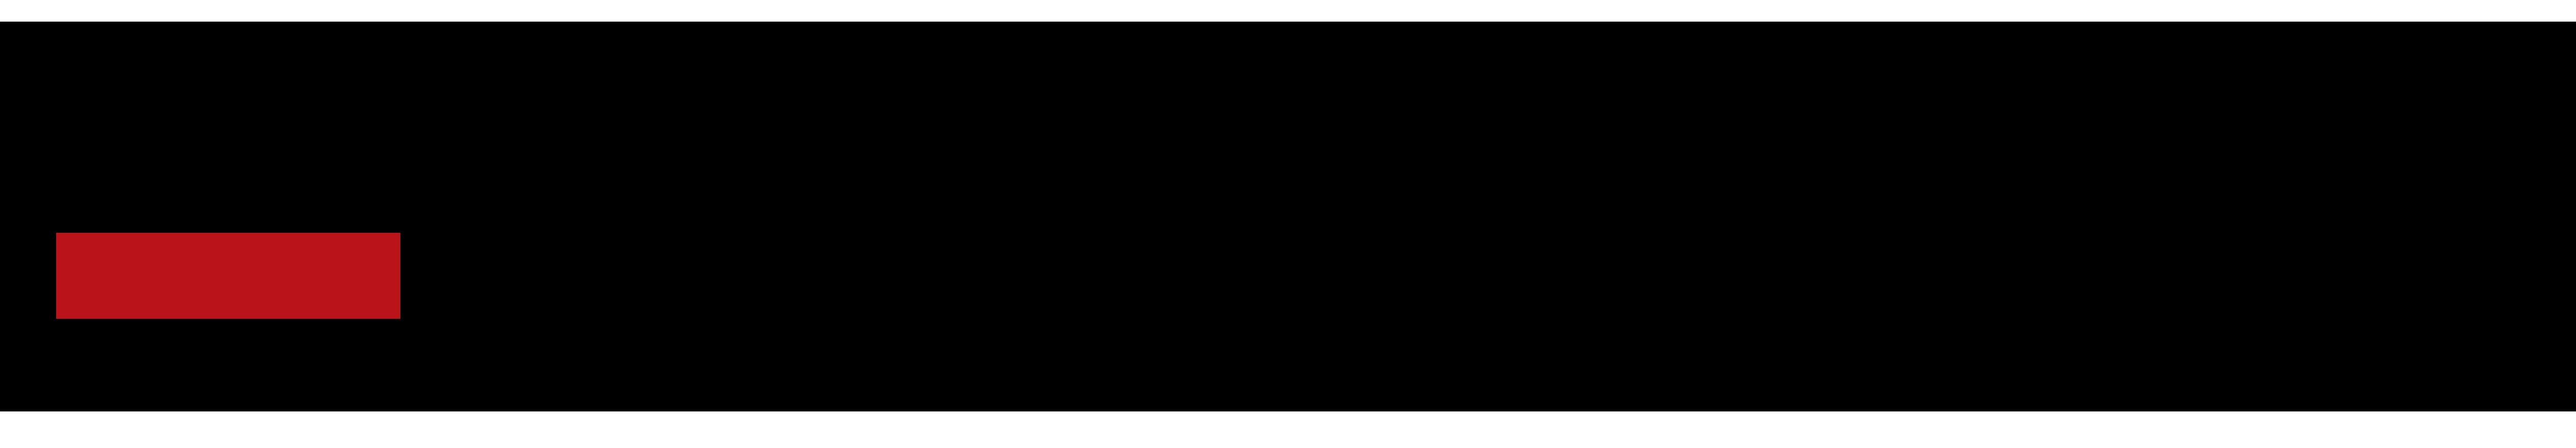 the jerusalem post � logos download